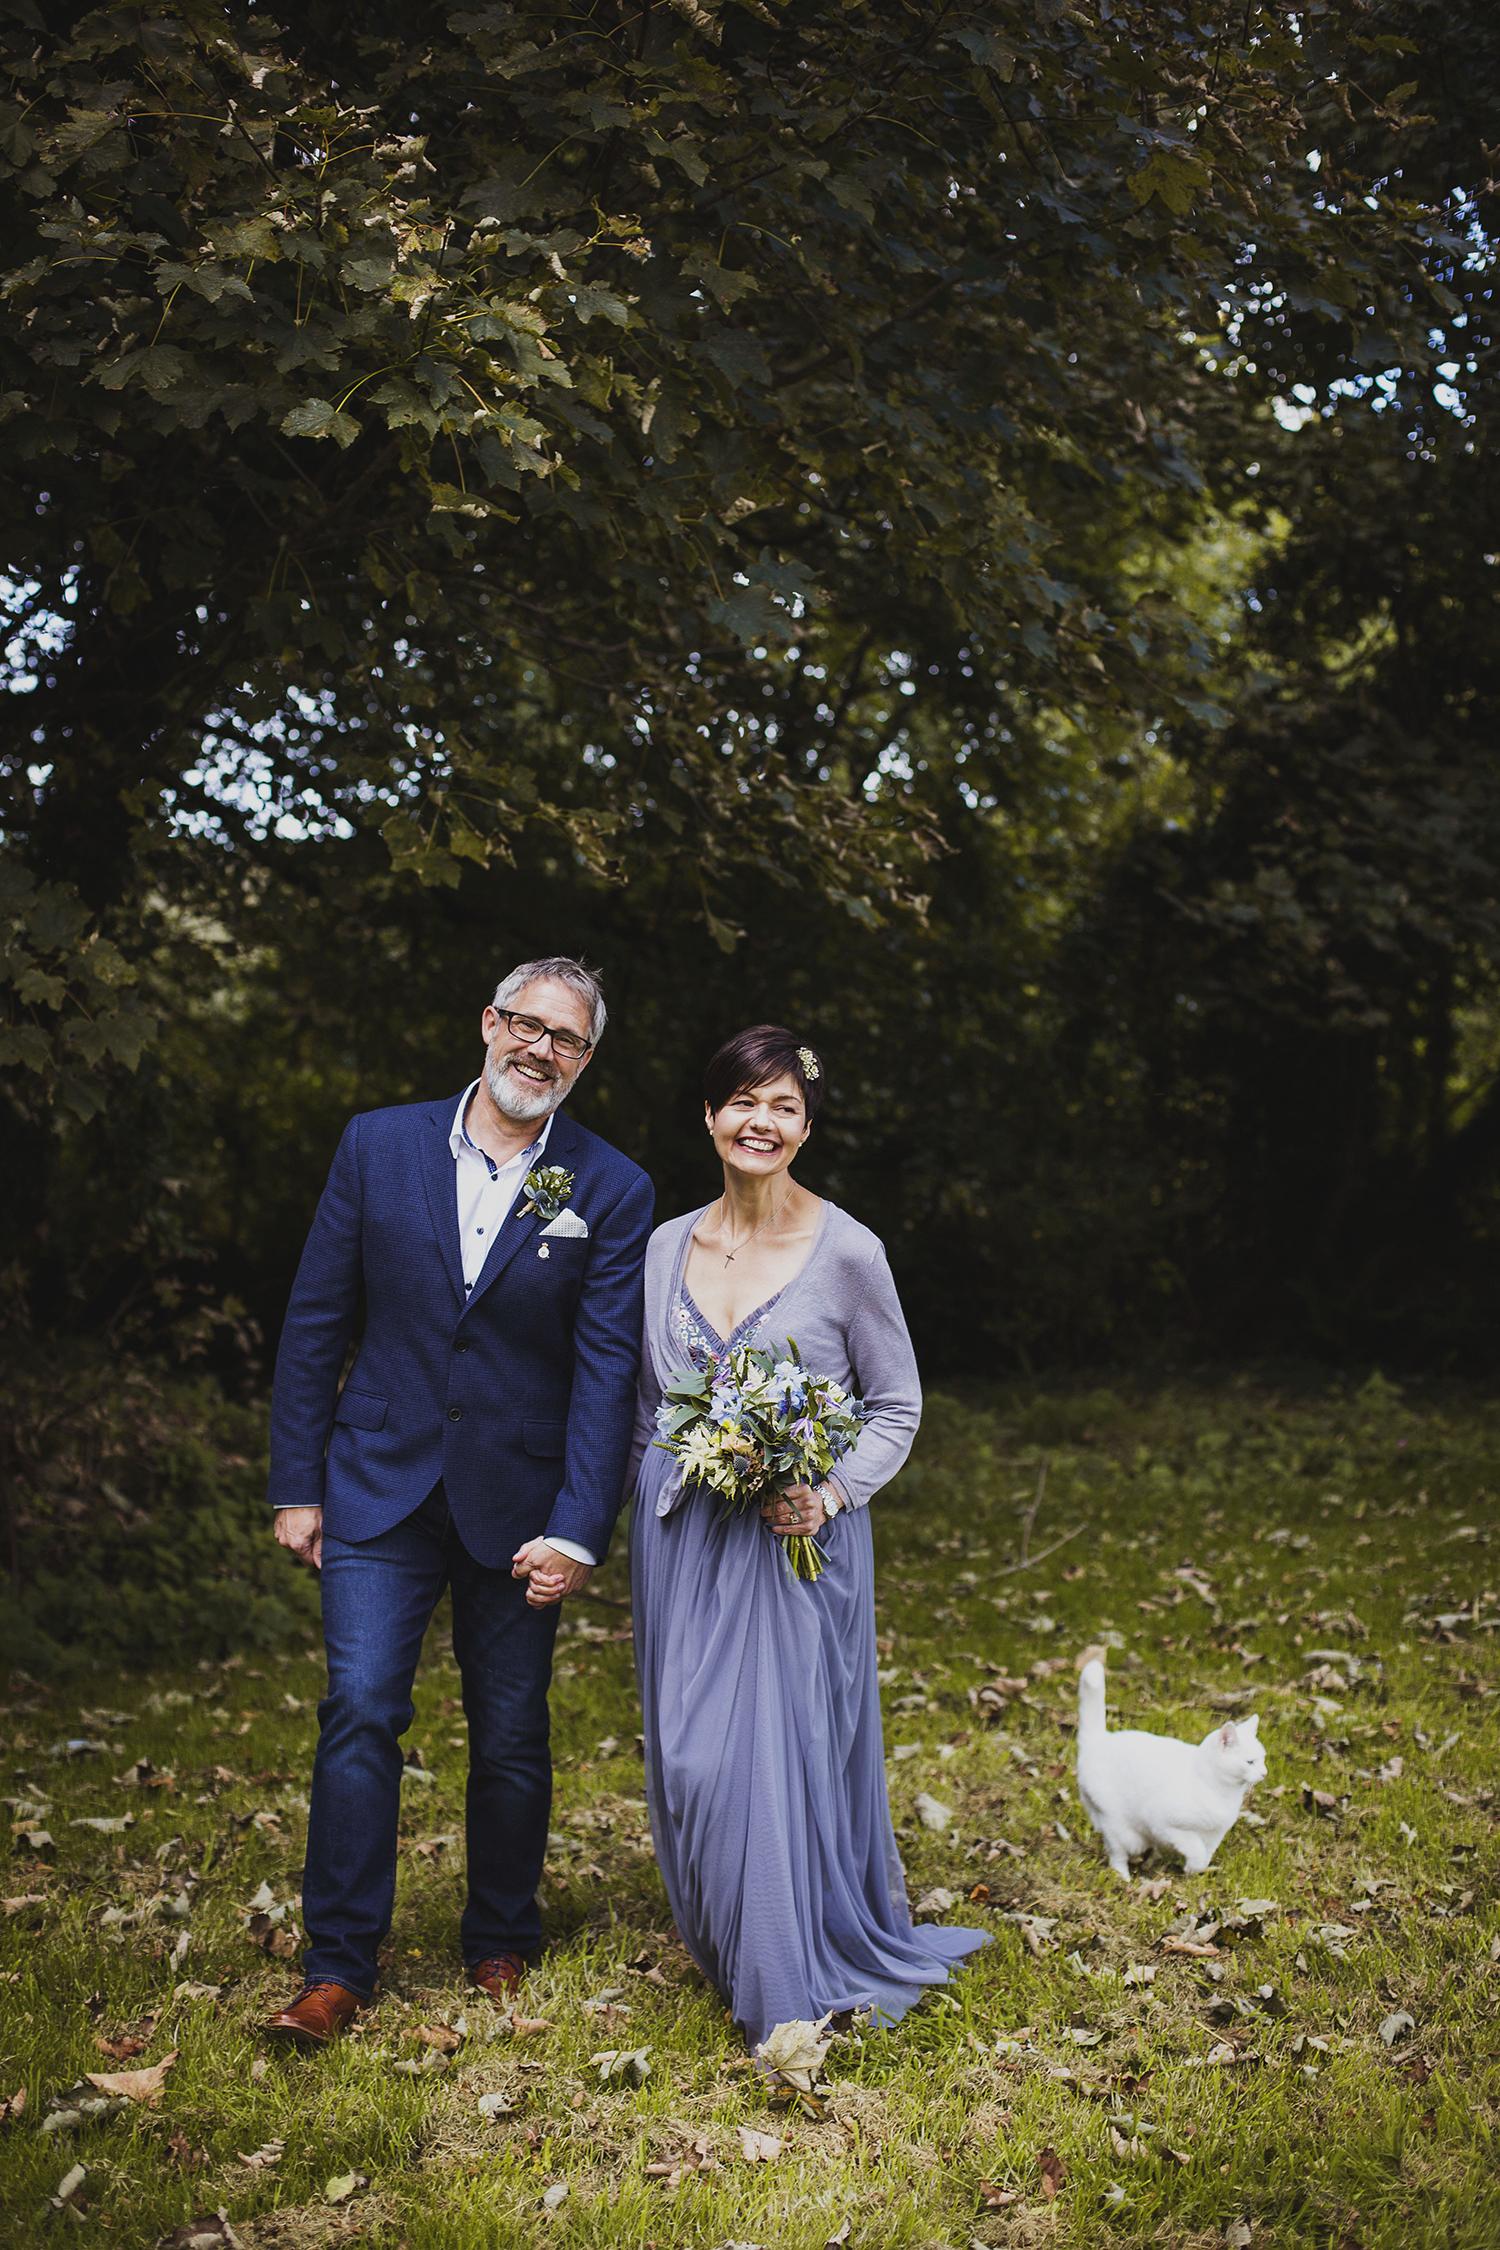 nantwen wedding pembrokeshire wedding photographer bride and groom with parsnip